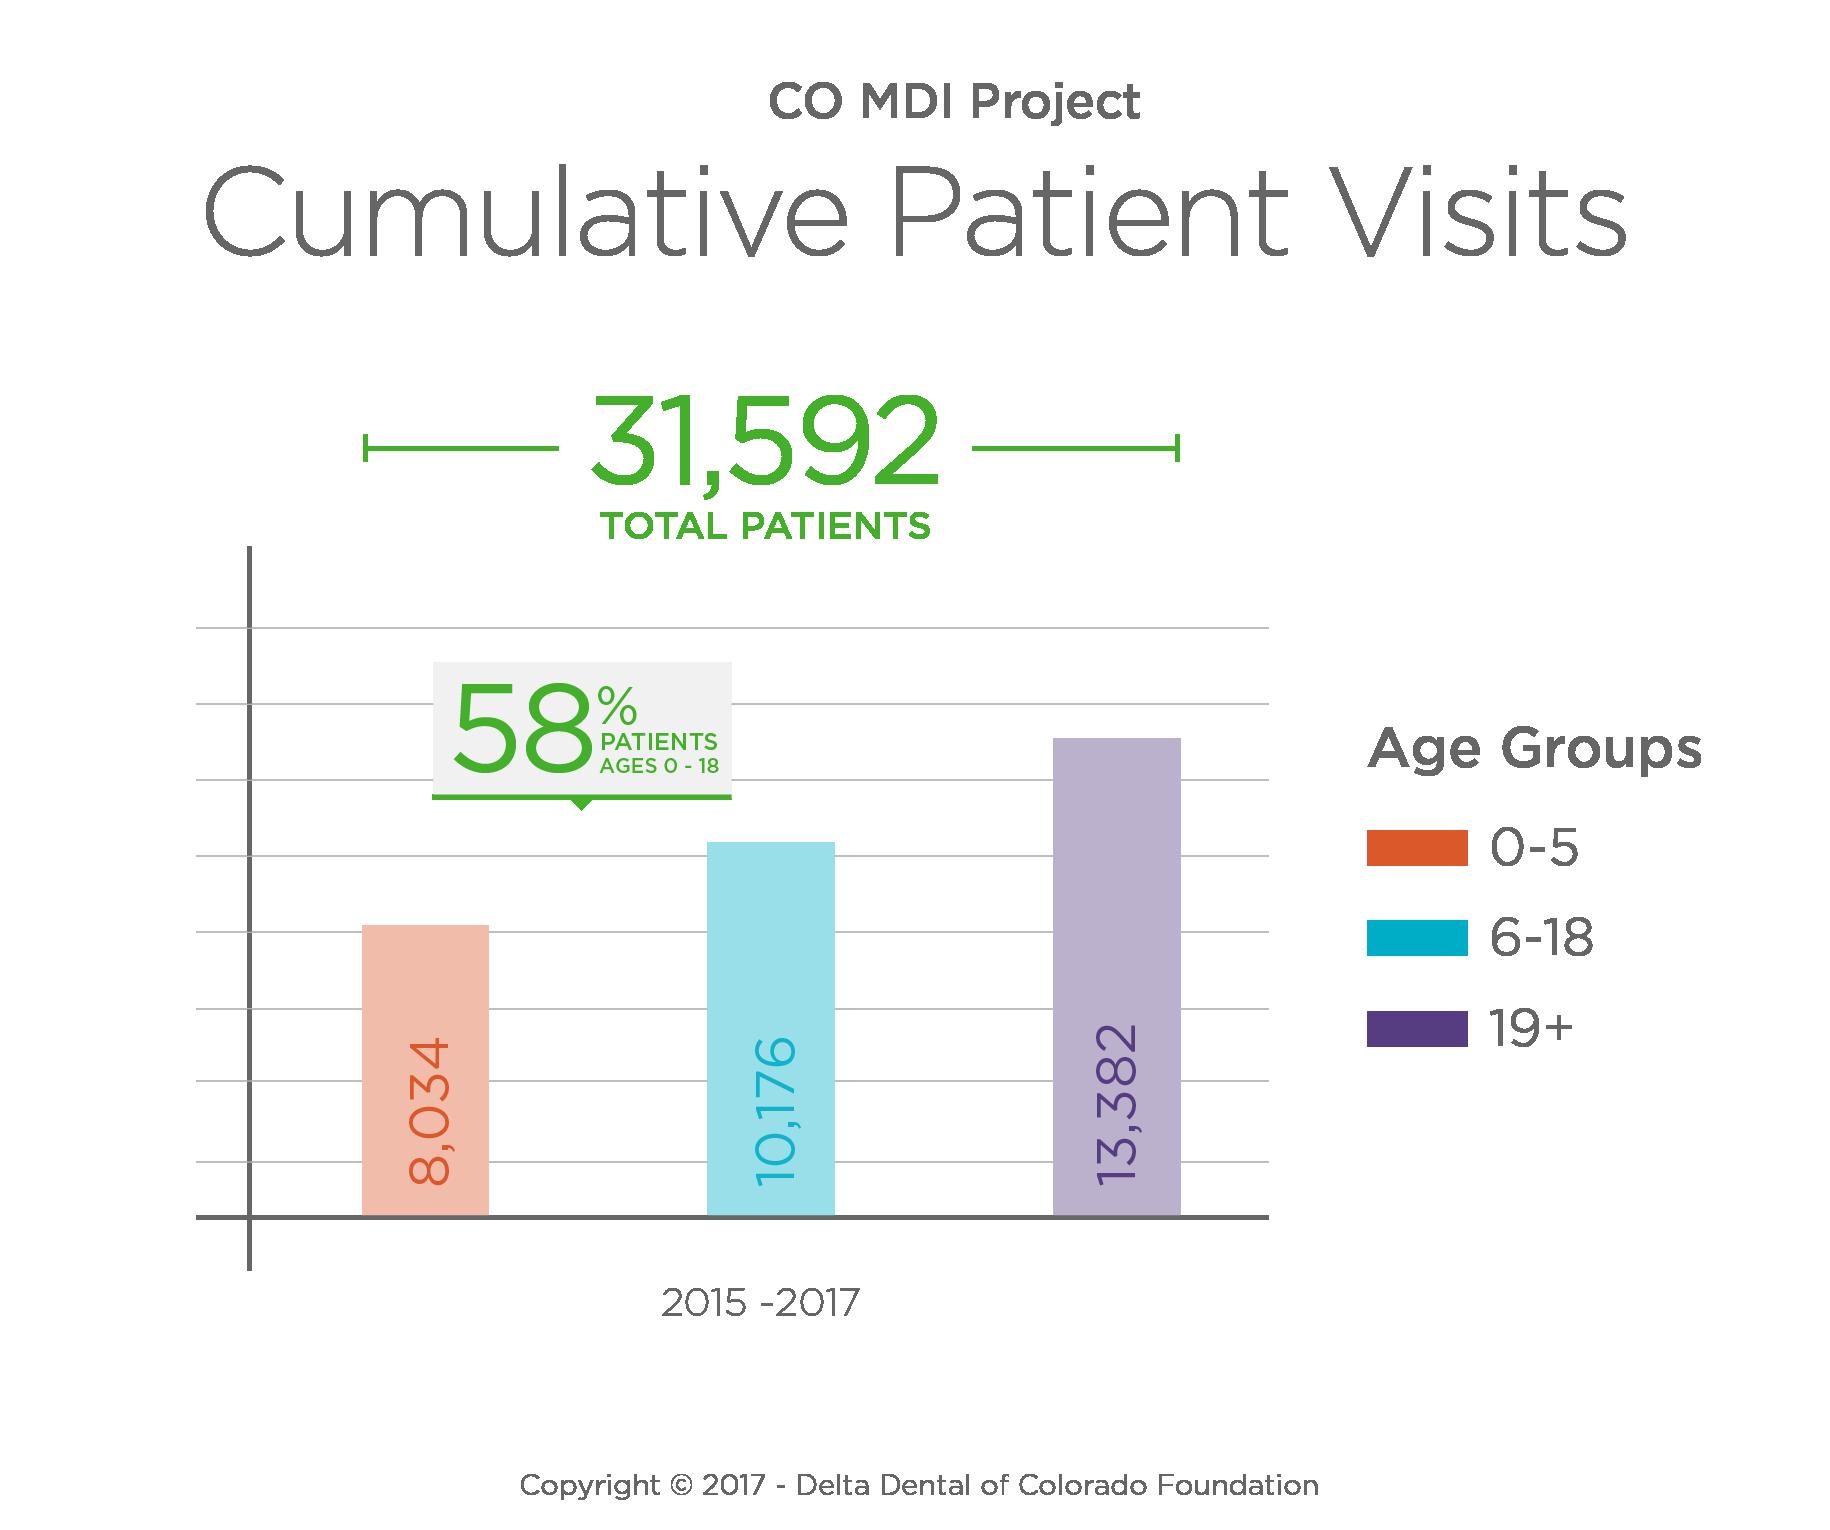 Cumulative Patient Visits